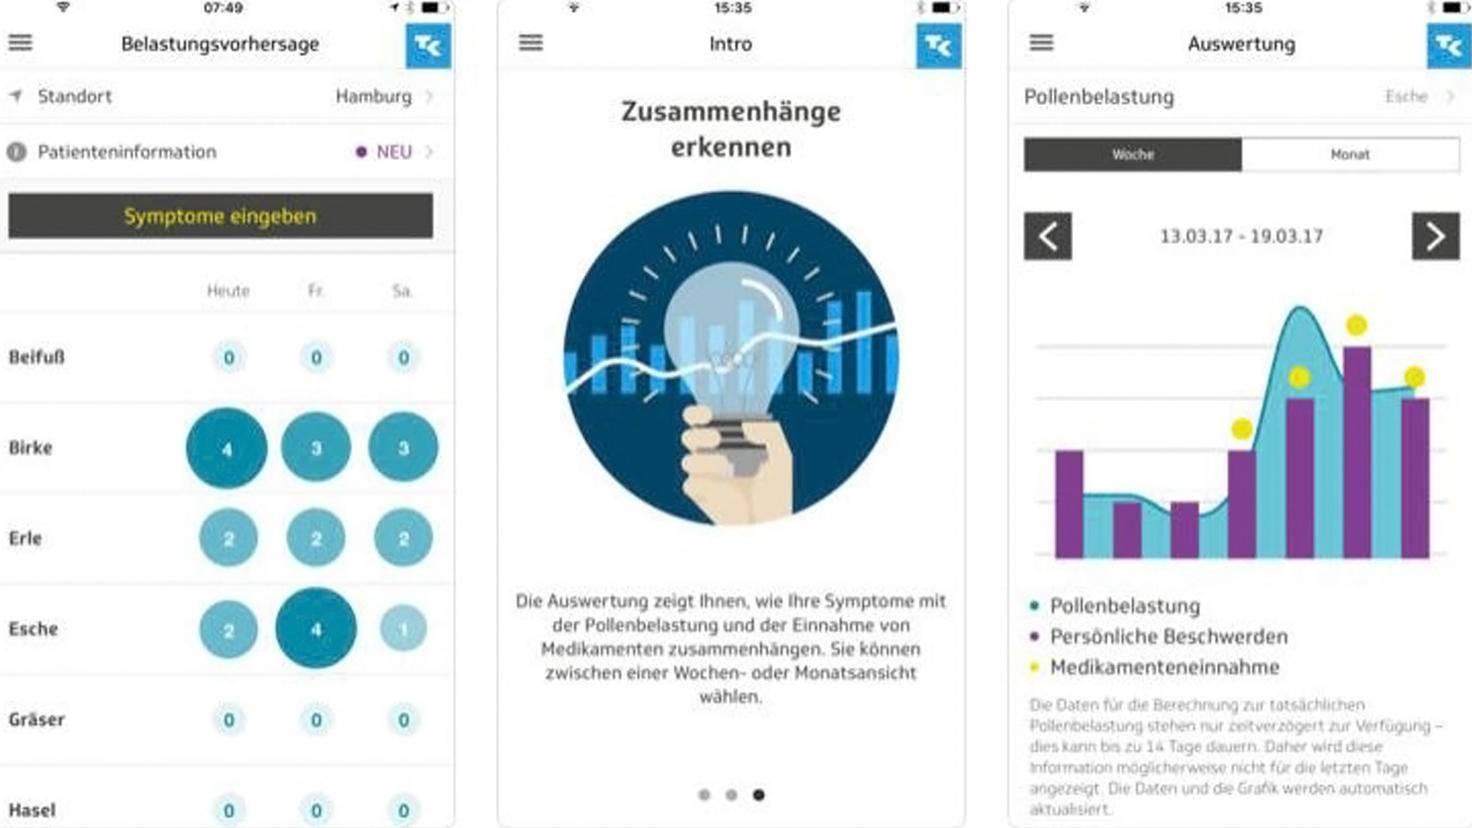 Husteblume-Pollenflug-App-iTunes-Techniker Krankenkasse